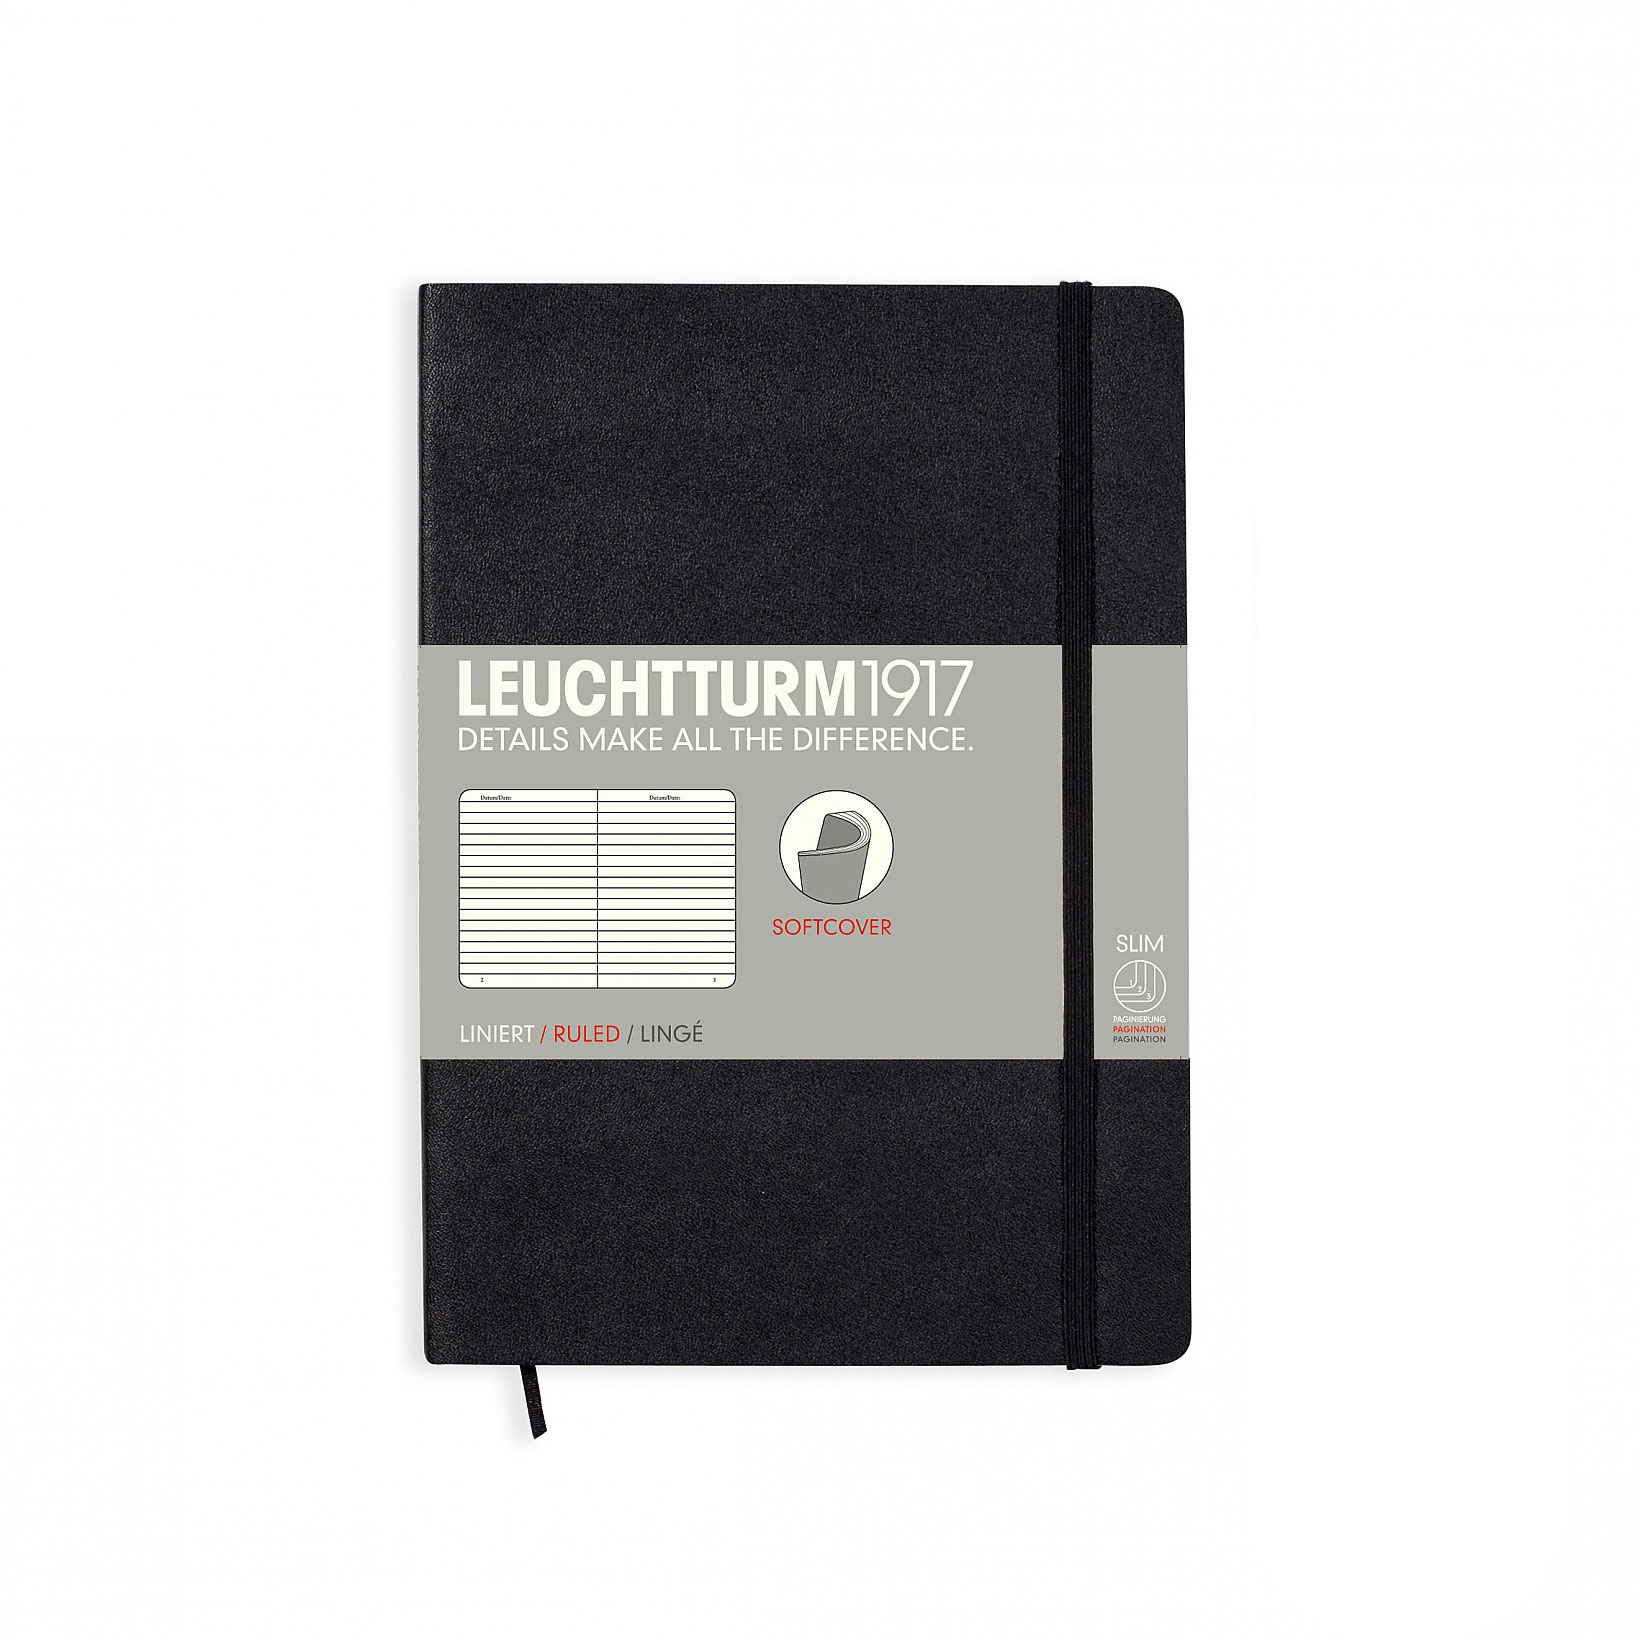 lch-mdm-softback-lined-black.jpg